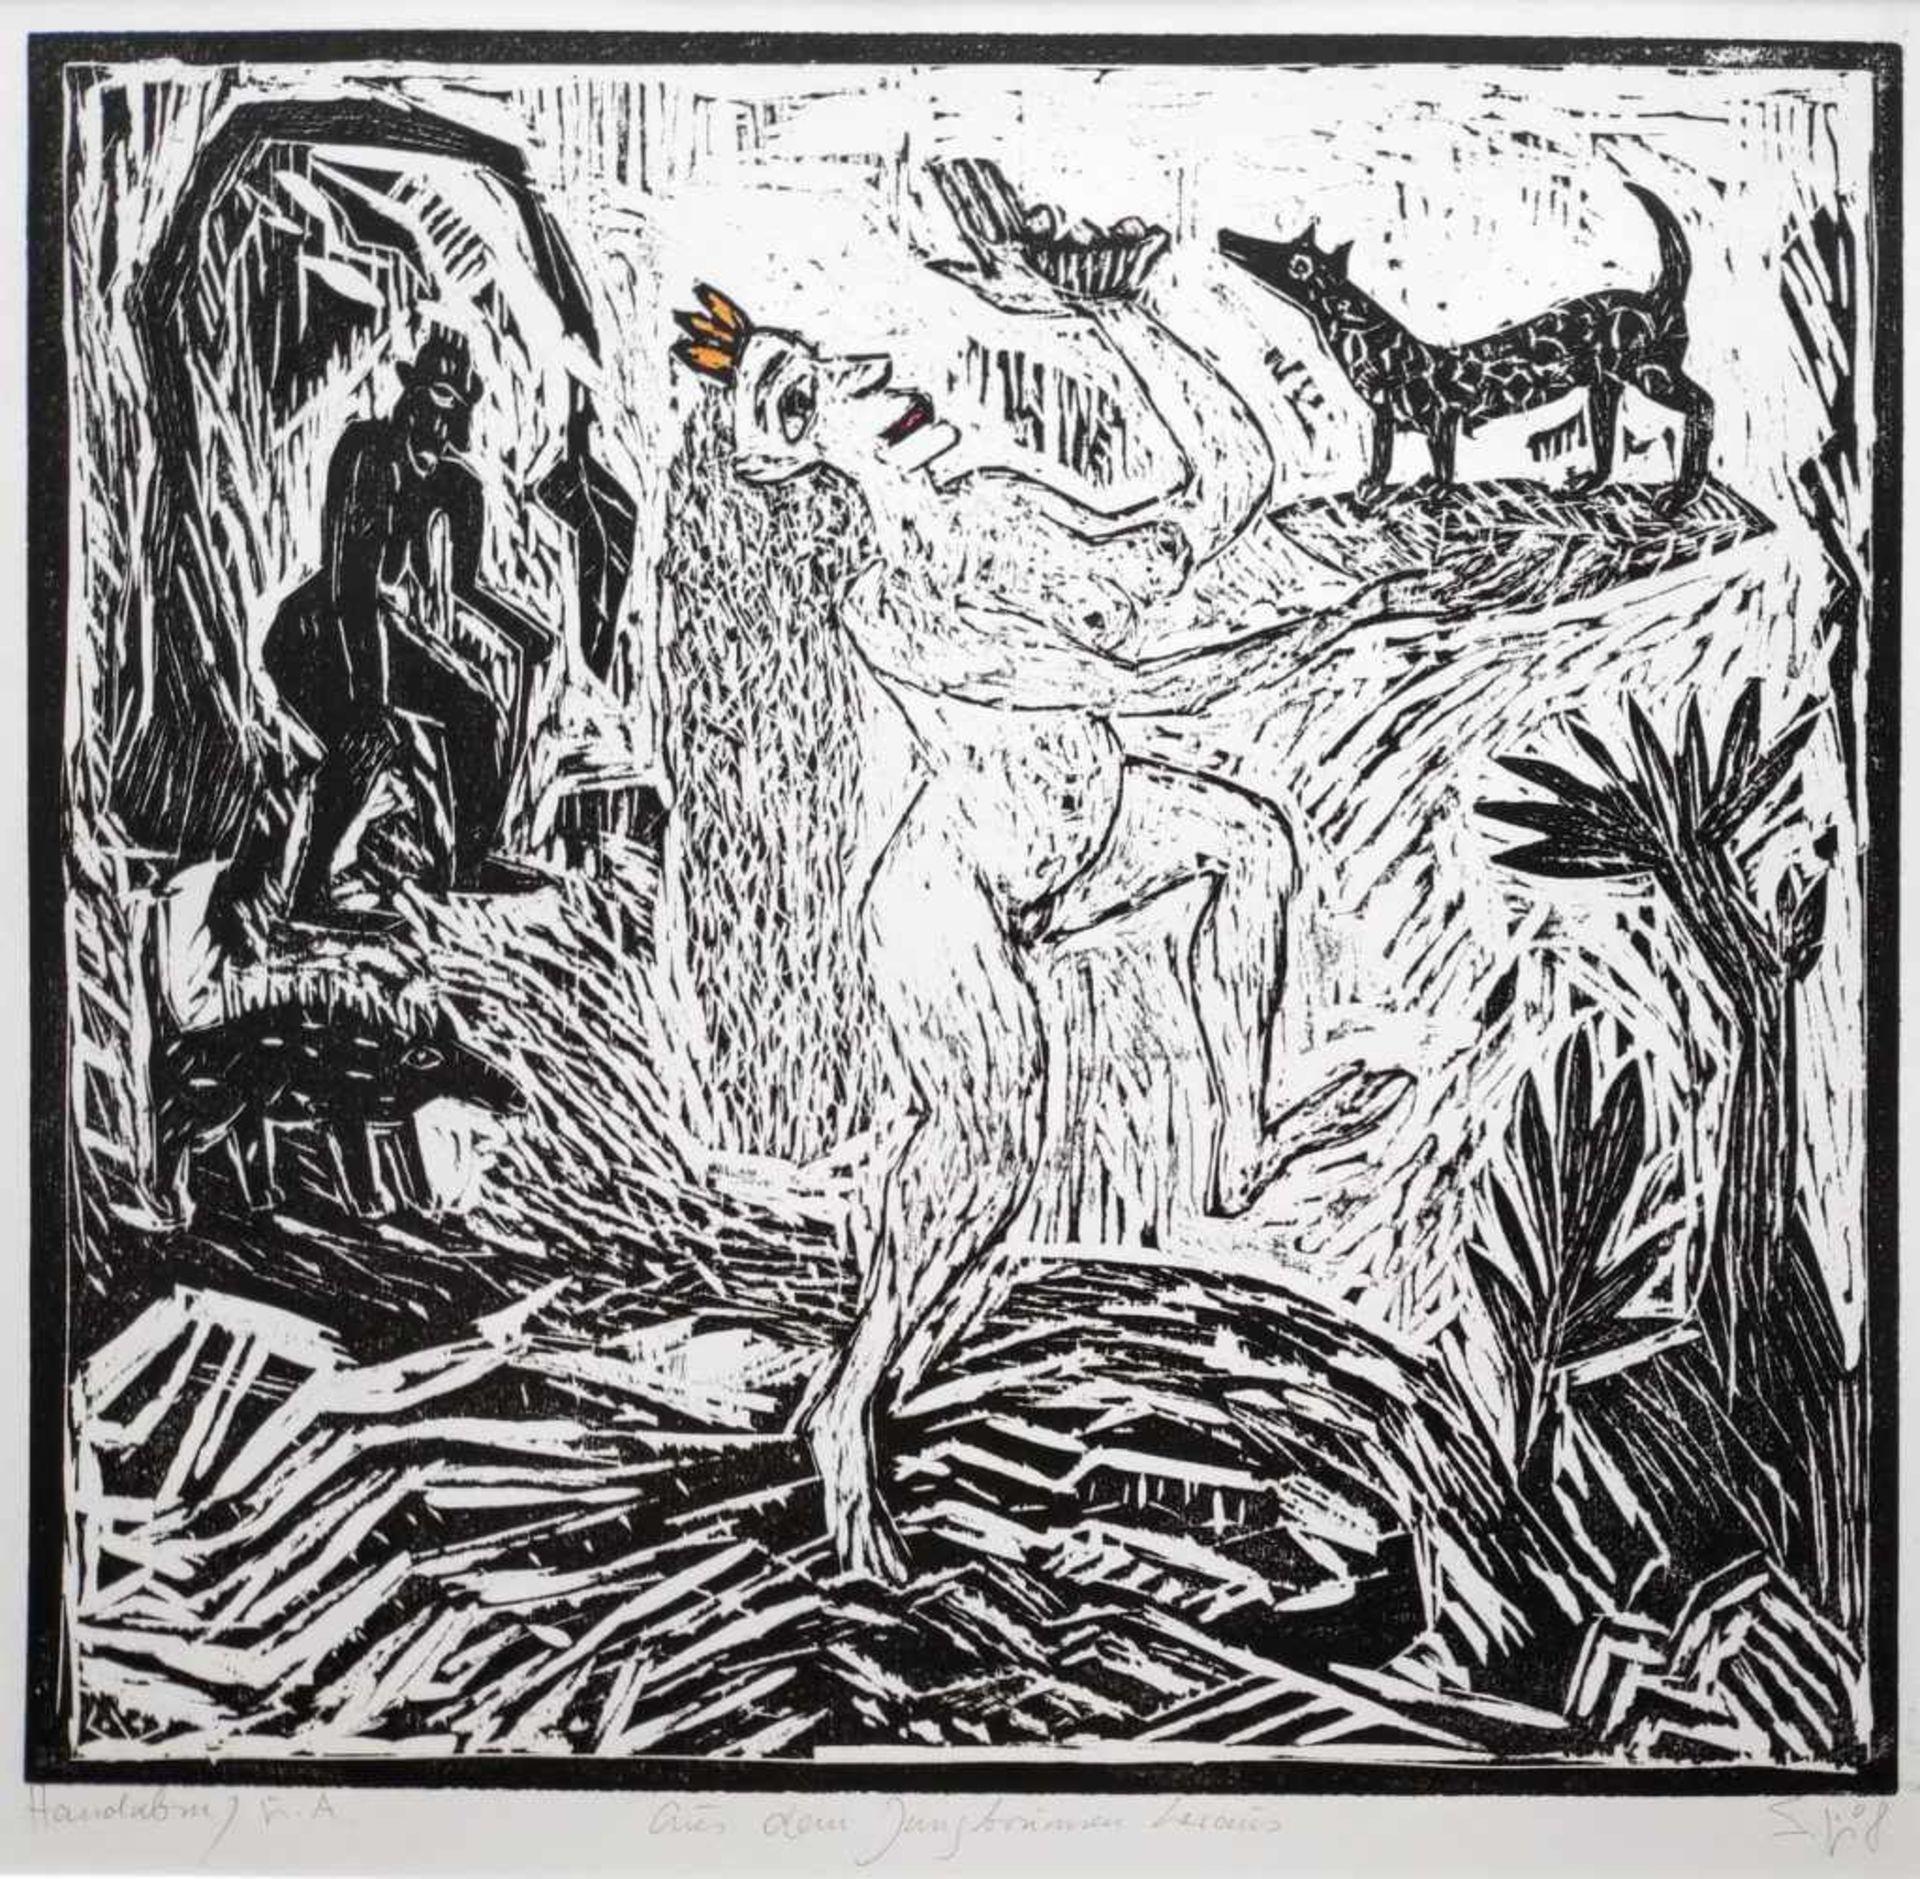 Leifer, Sybille (1943 Krakow, lebt in Sanz bei Greifswald)